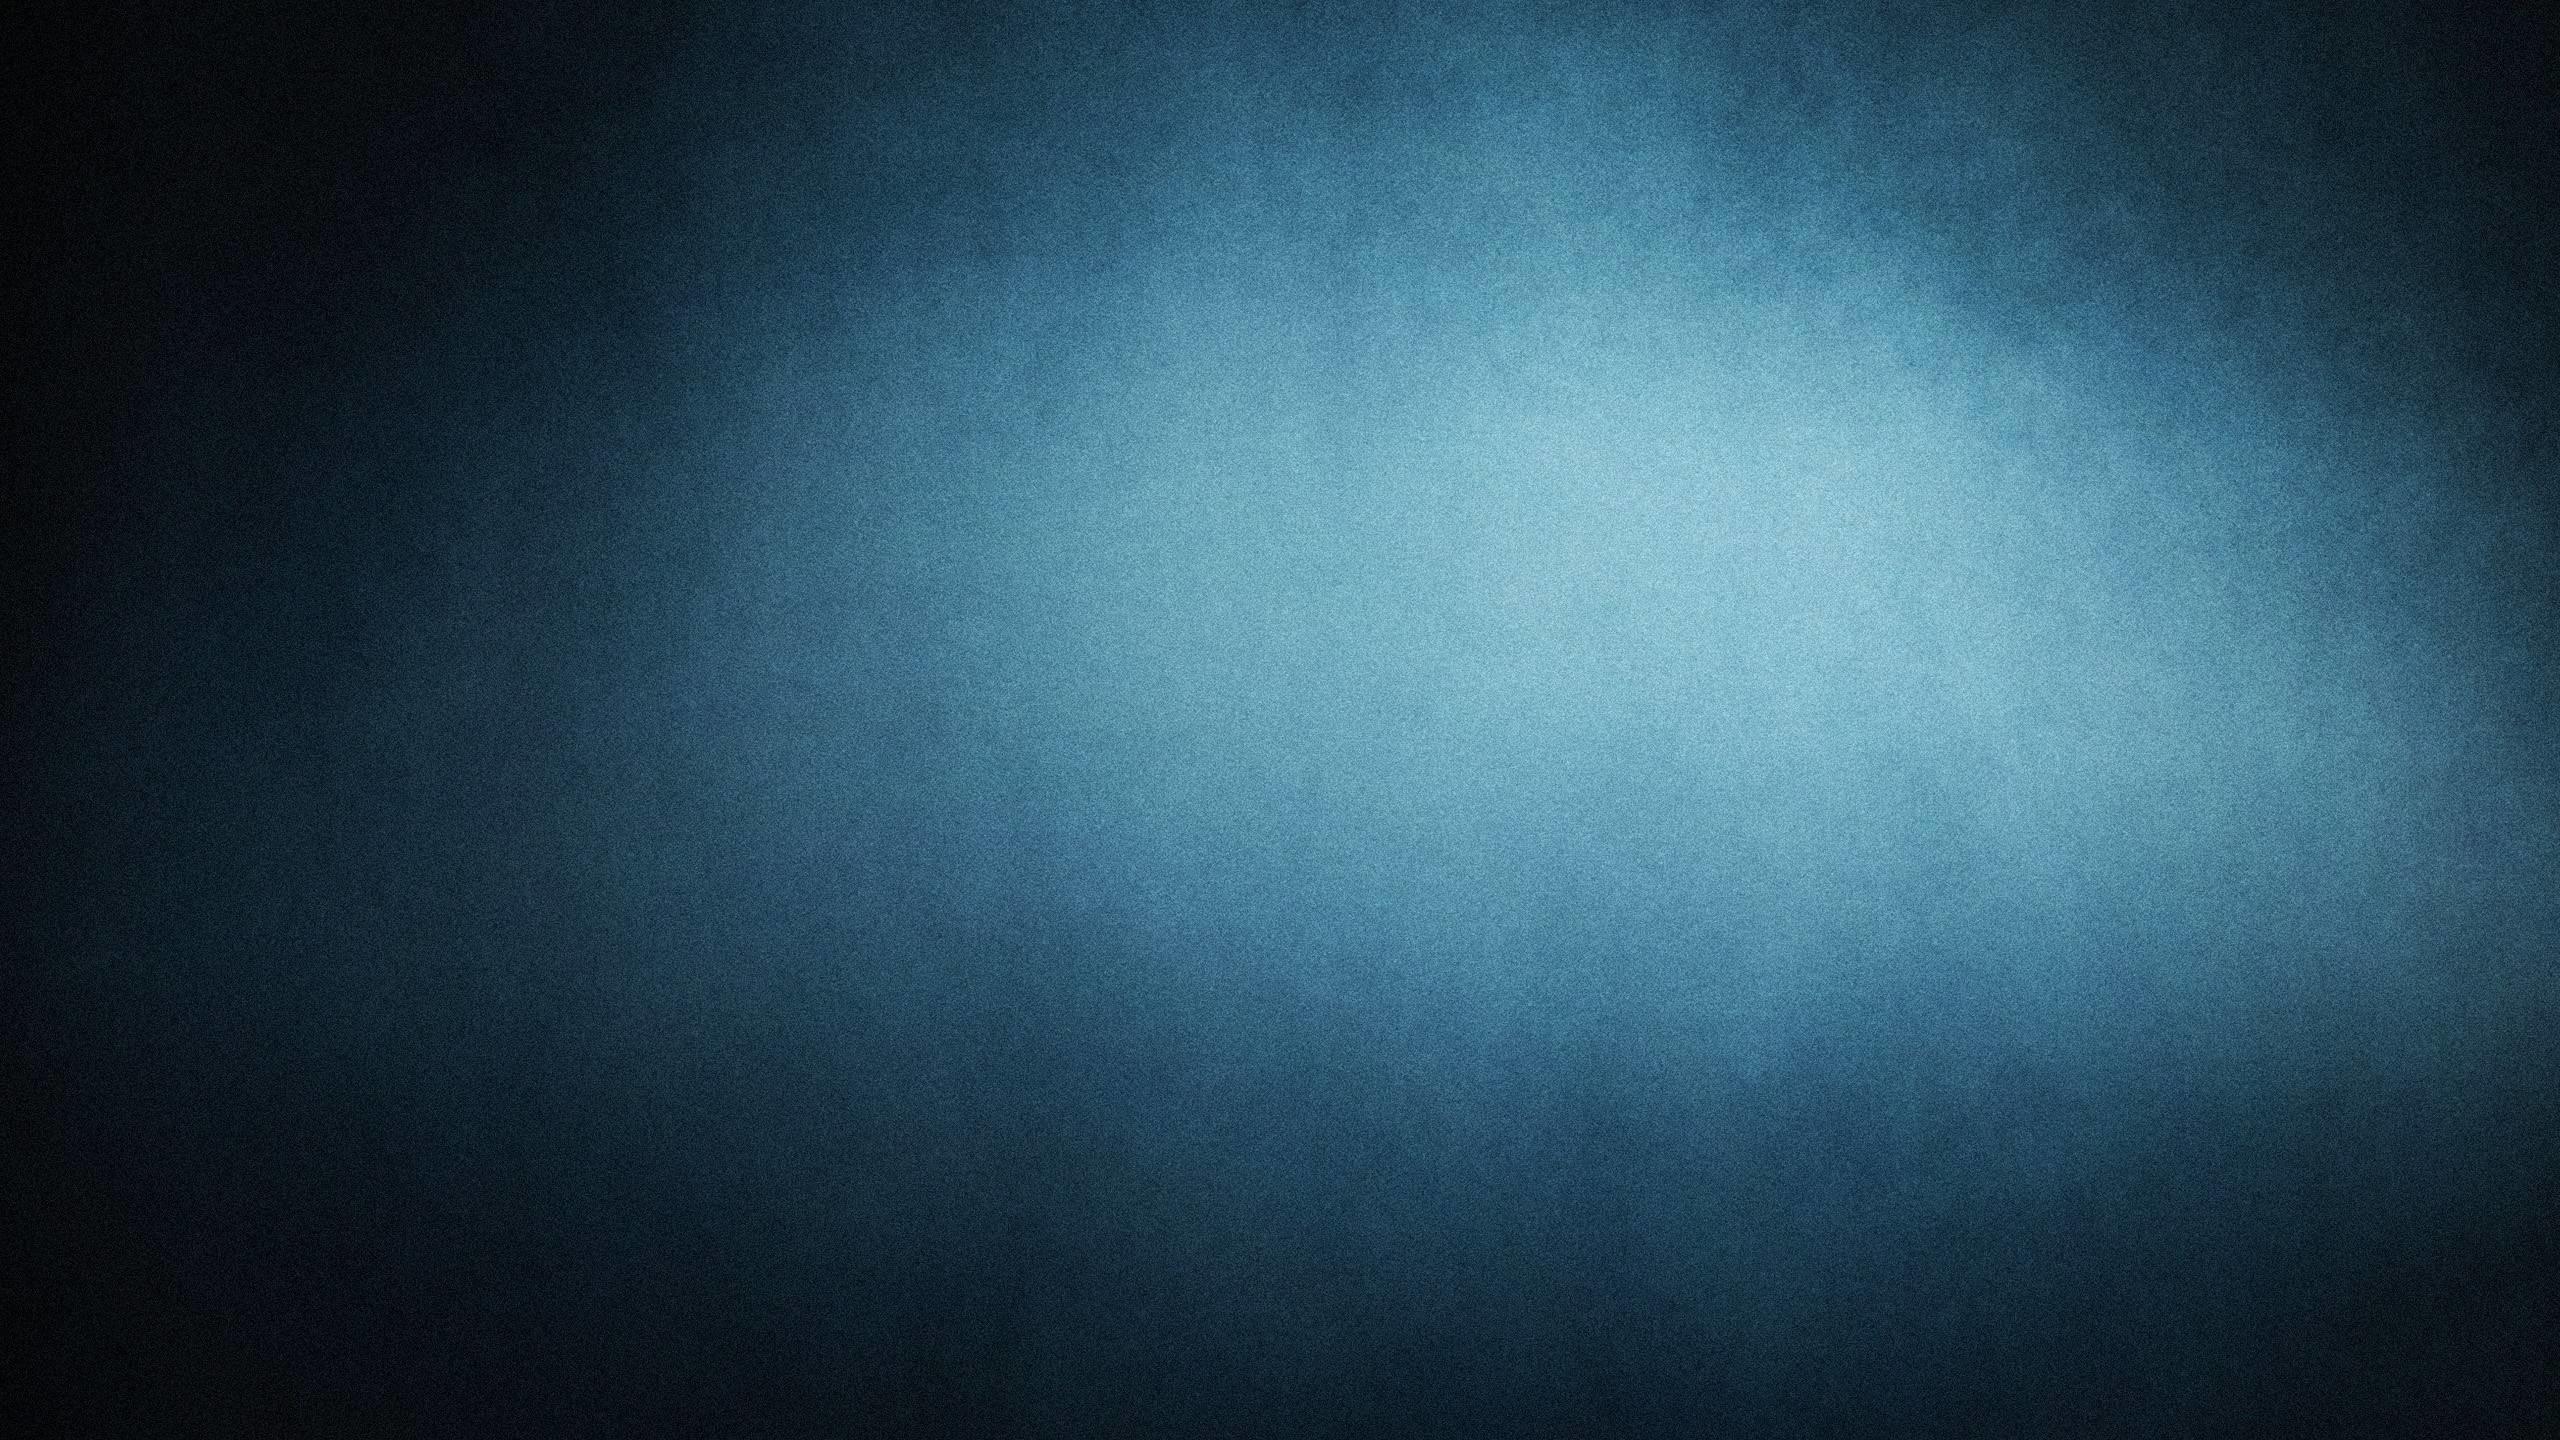 72 Blue Desktop